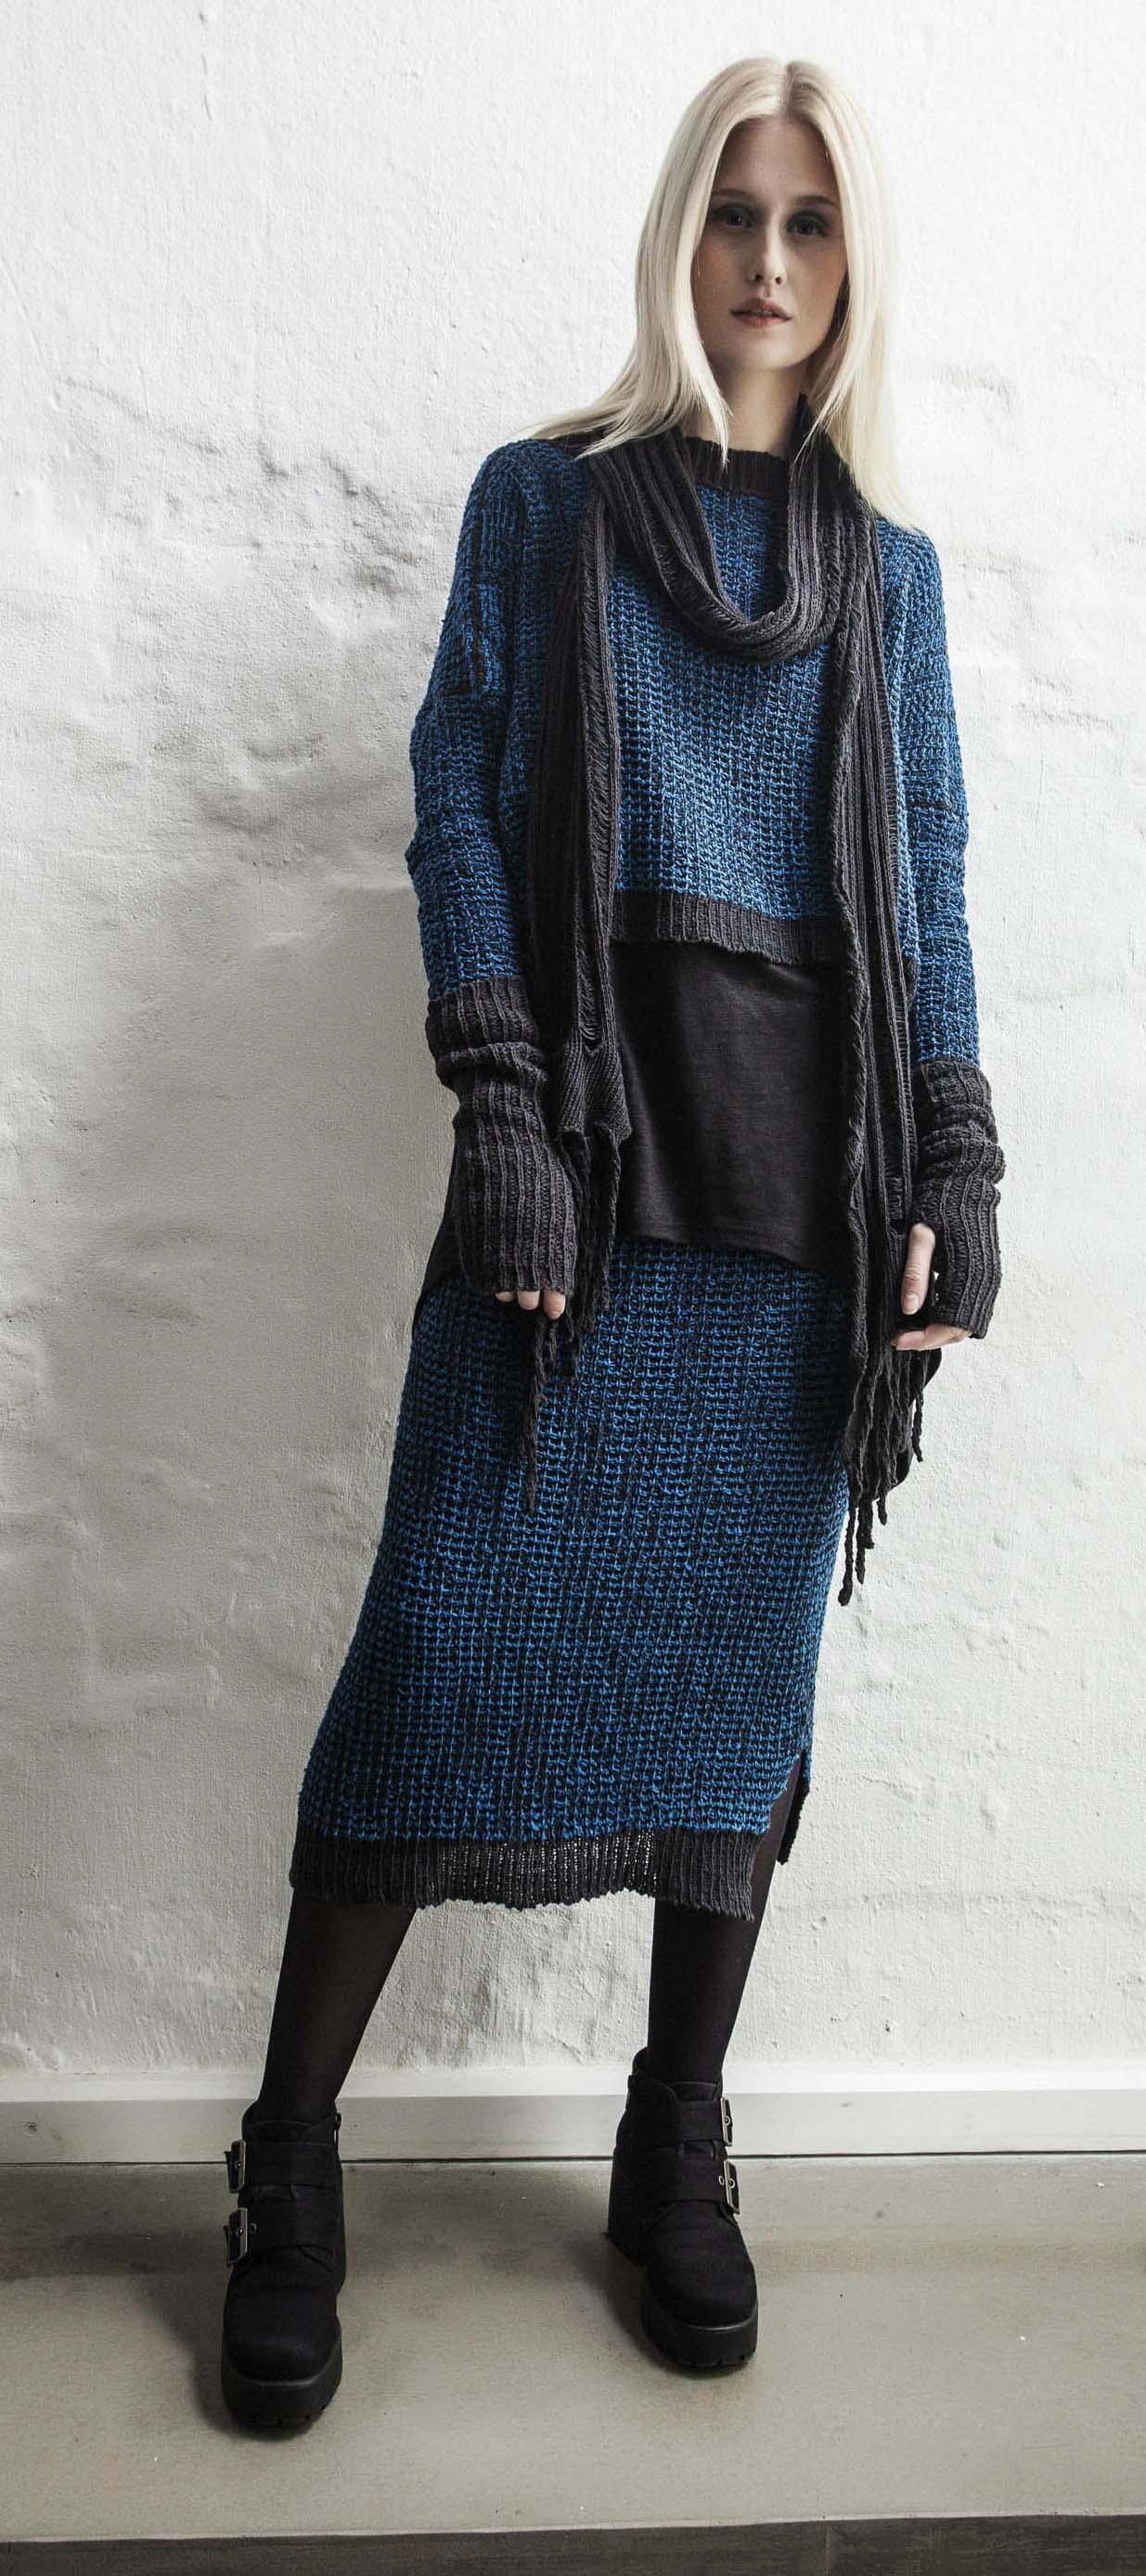 kjol pulover baksida franssjal handledsv2.jpg